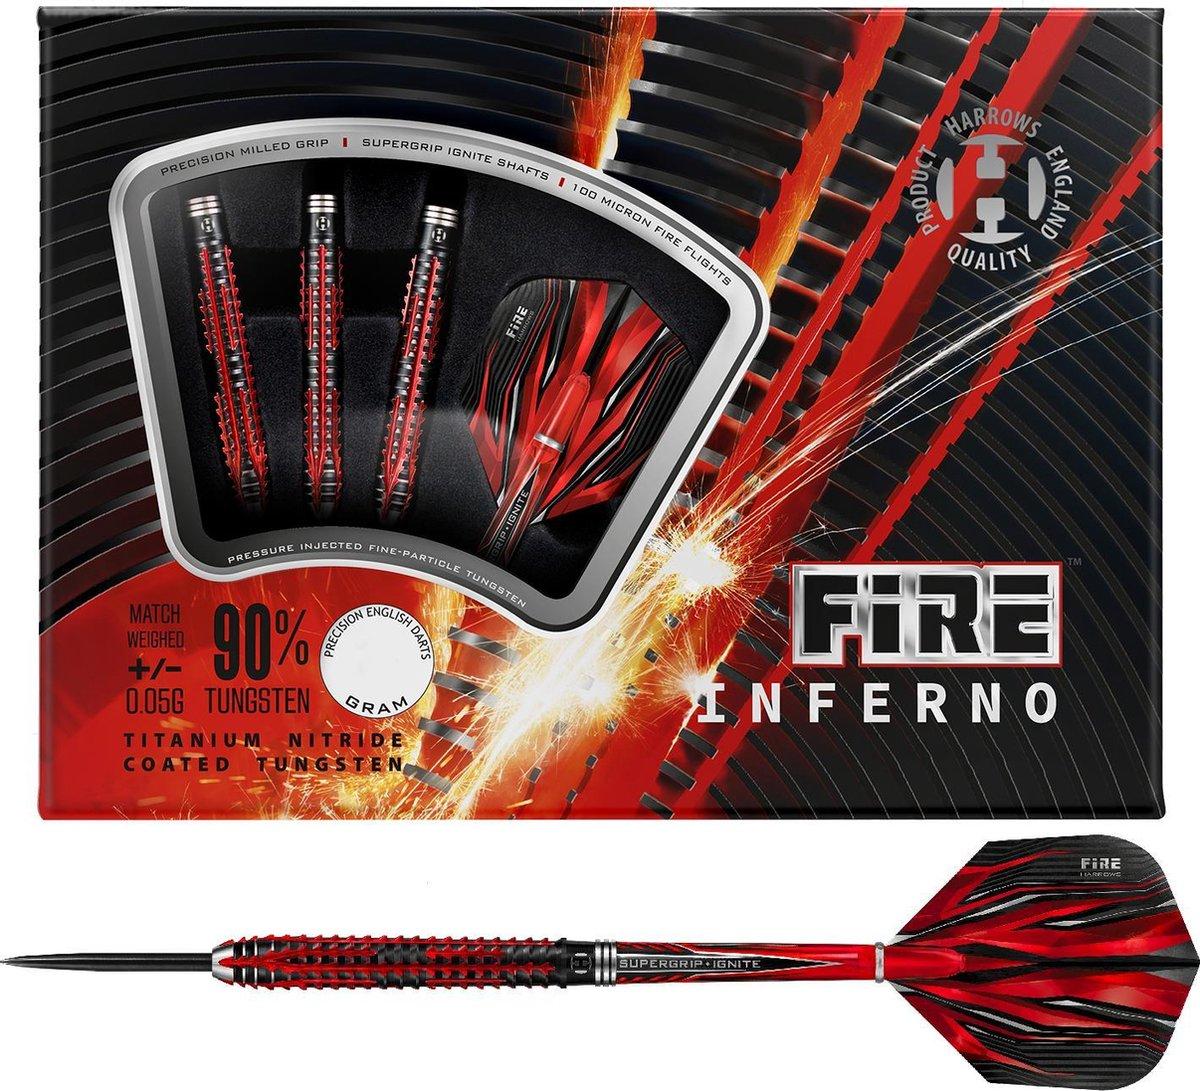 Harrows Fire Inferno 90% - 24 Gram